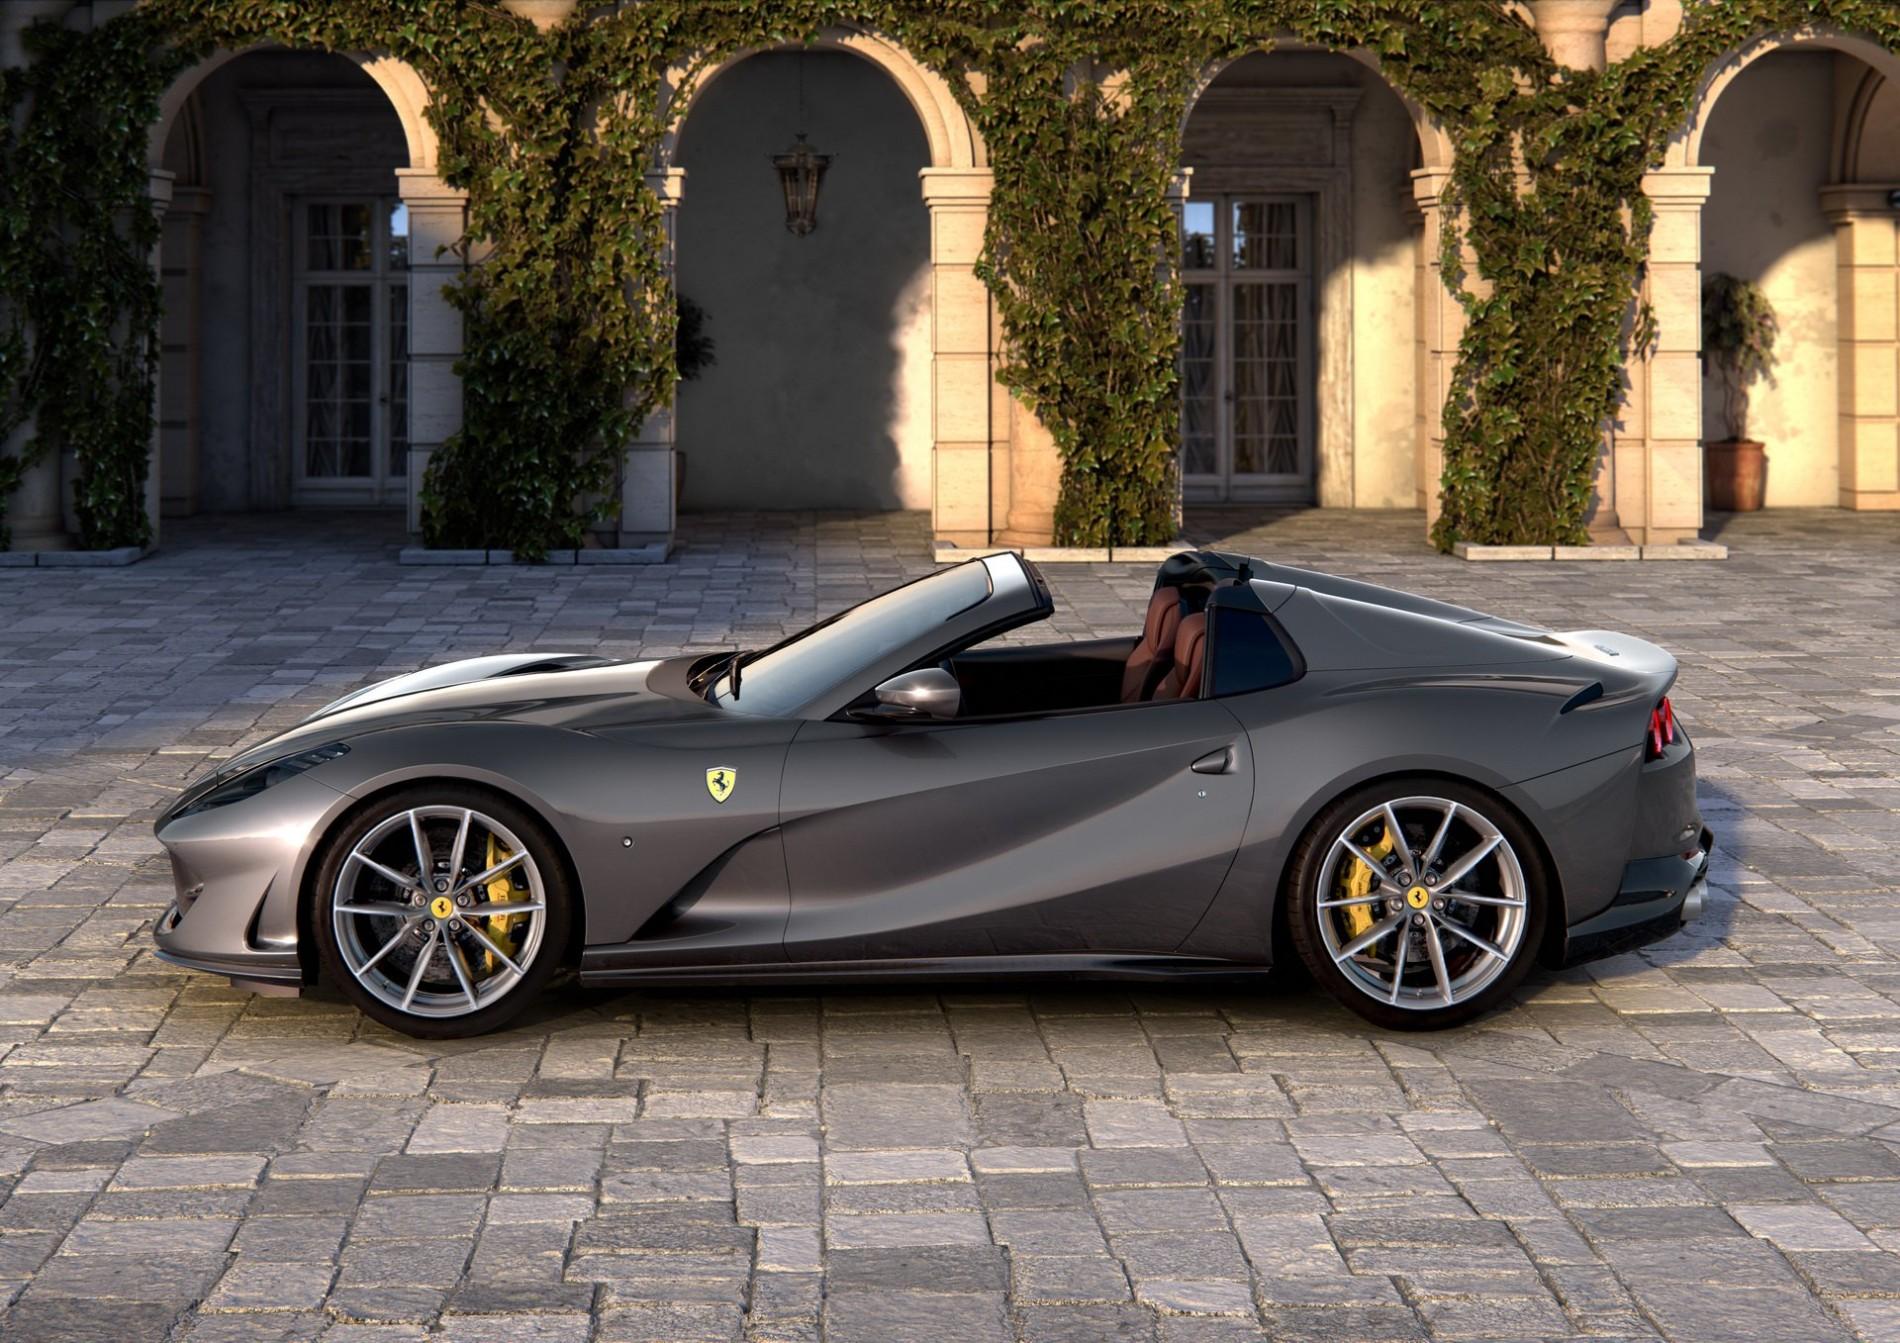 Ferrari 812 GTS - Ferrari 812 GTS